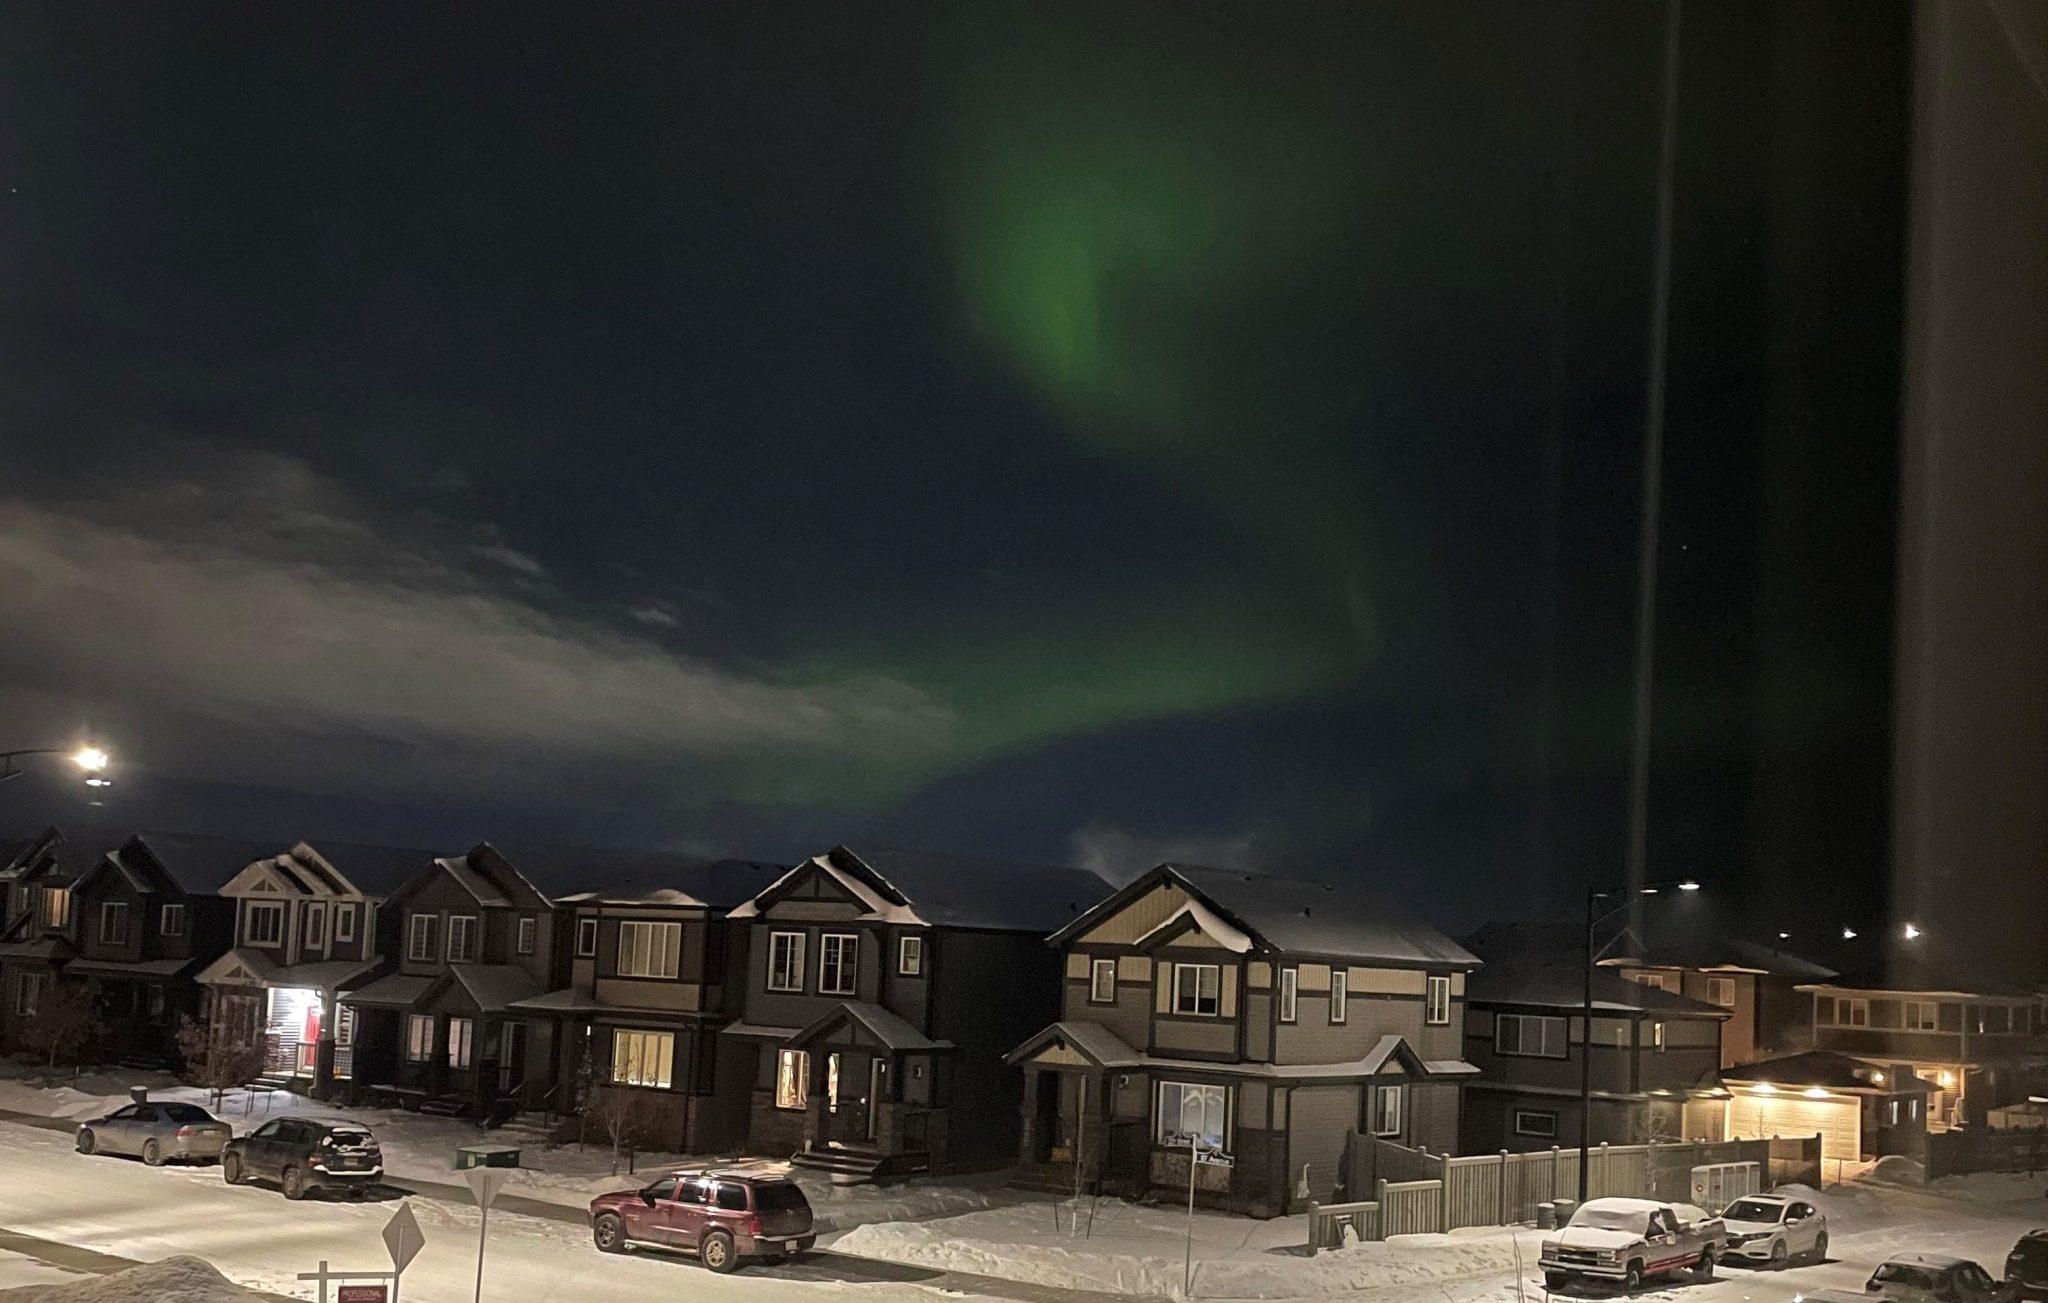 The northern lights were highly visible over Edmonton on Saturday, Feb. 6, 2021. Shot taken in west Edmonton neighbourhood of Rosenthal.